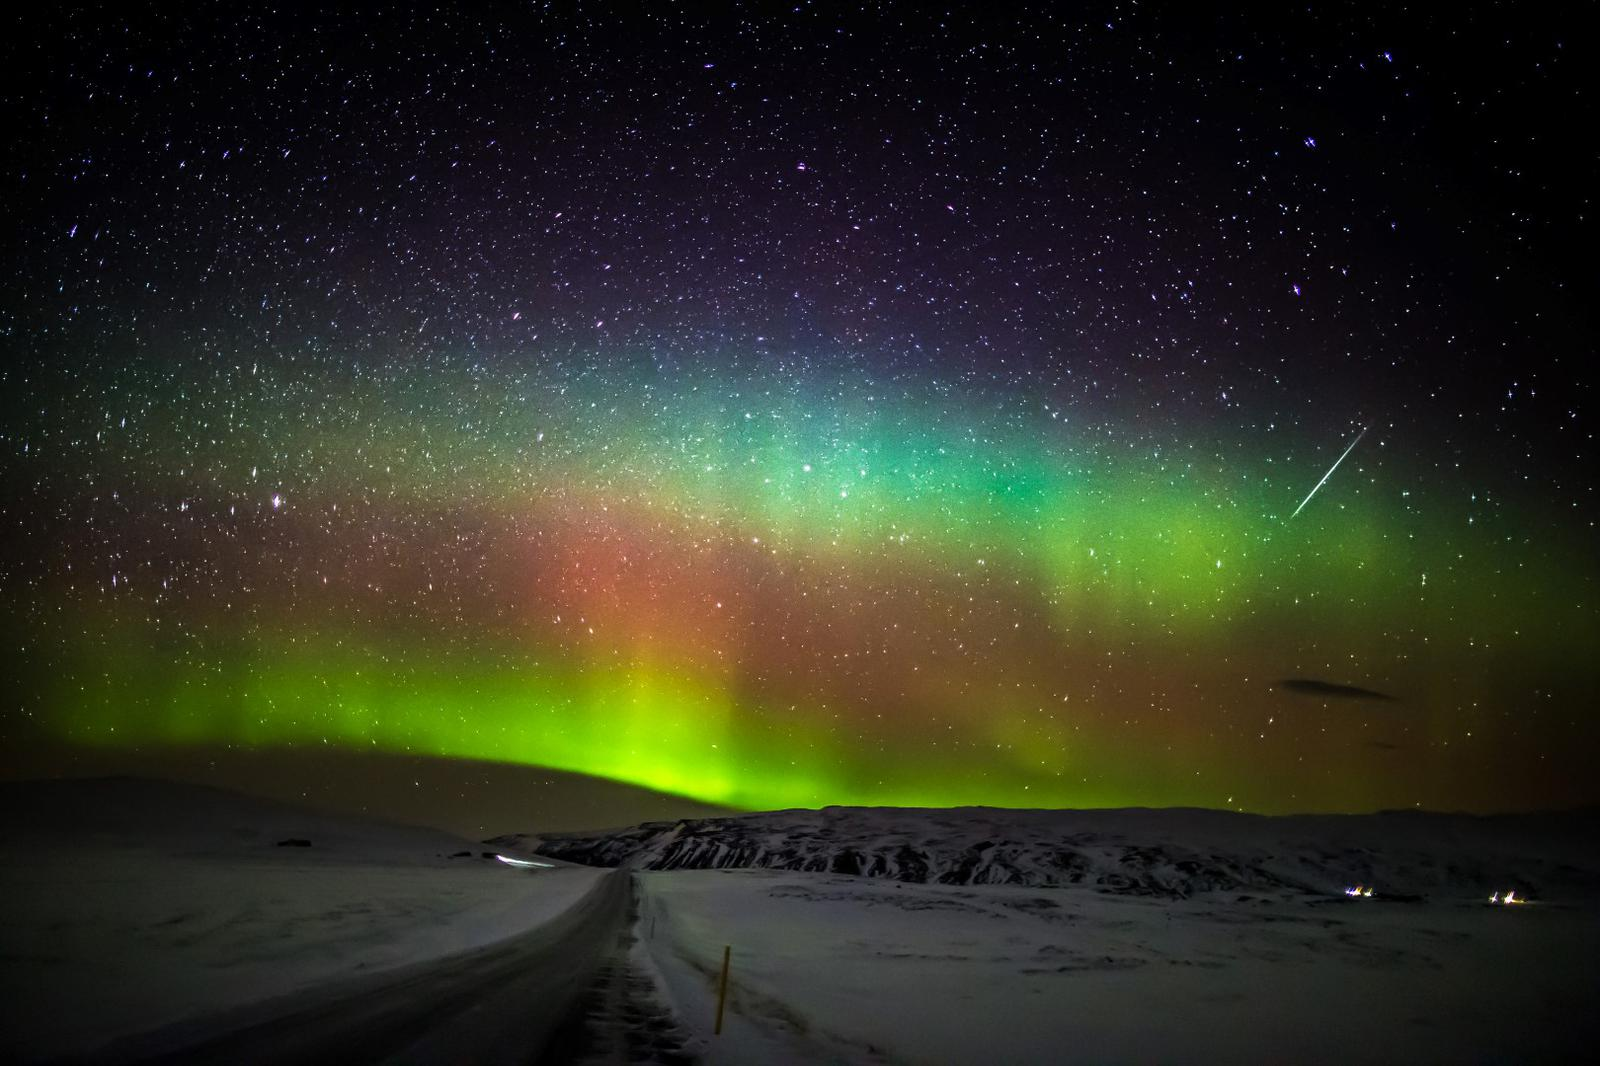 ver las estrellas turismo astronomico stargazing nordurljos